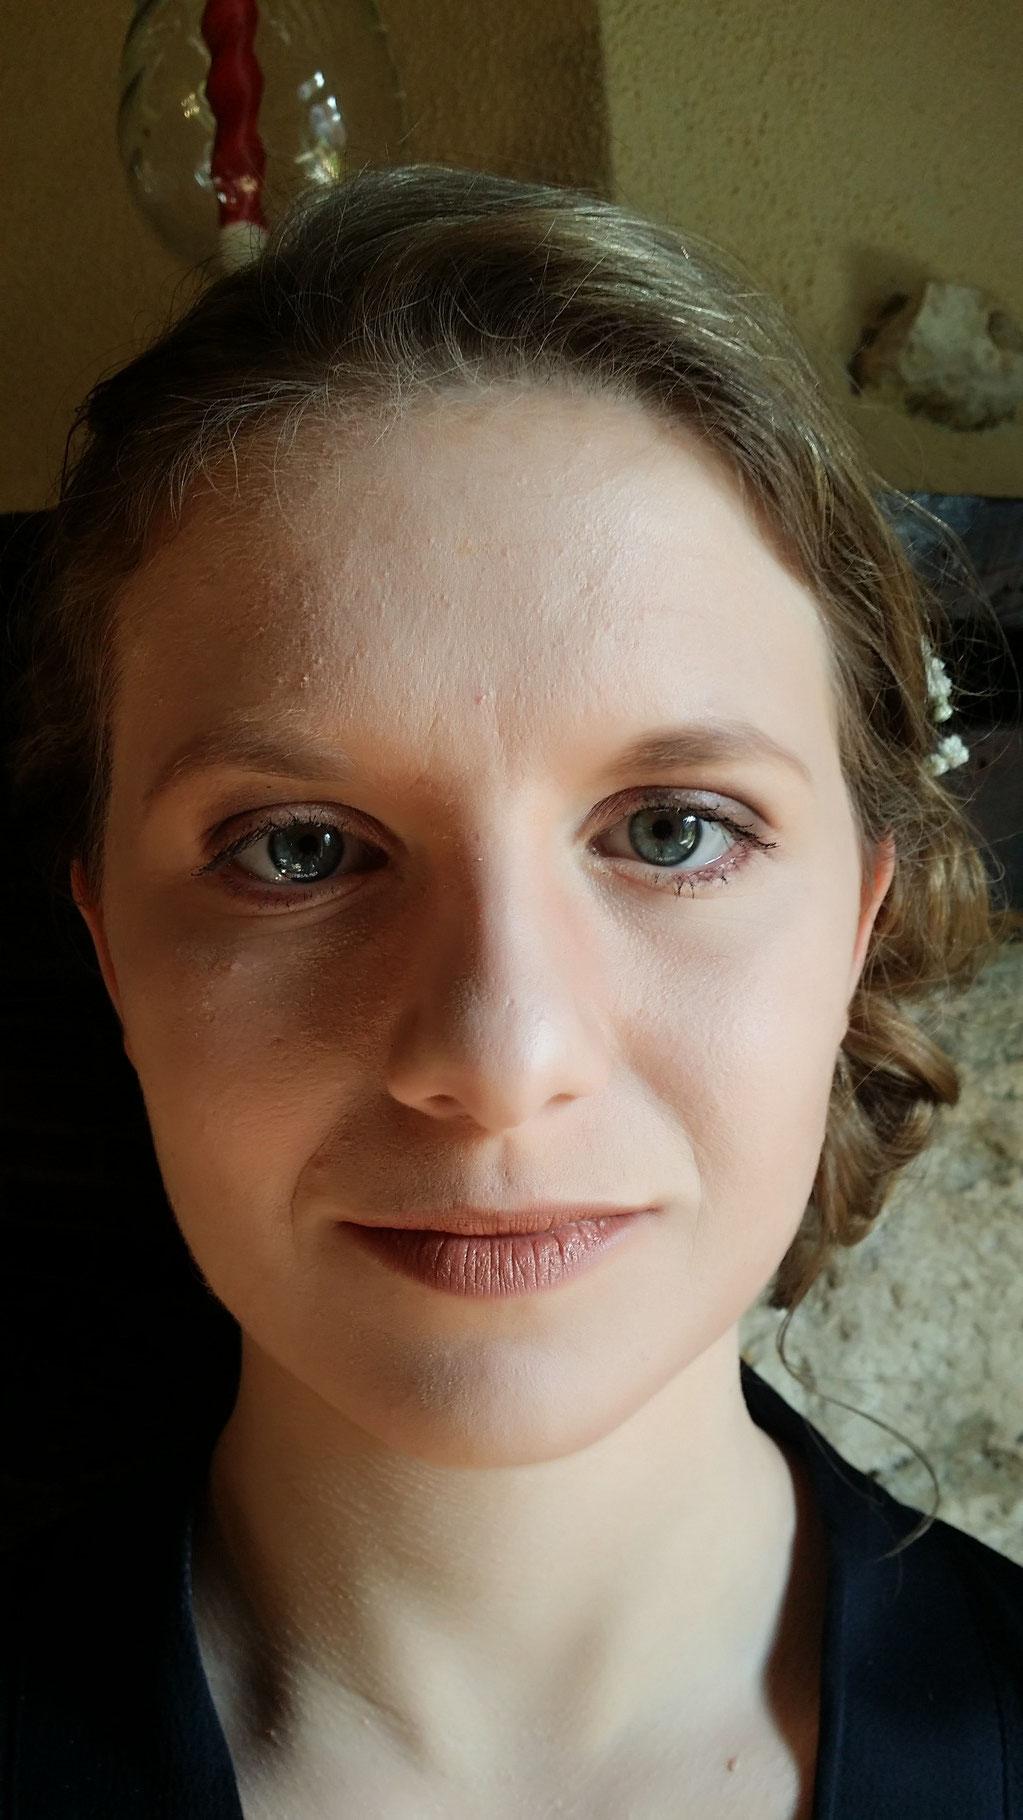 Maquillage mariée en nuances harmonieuses de marron